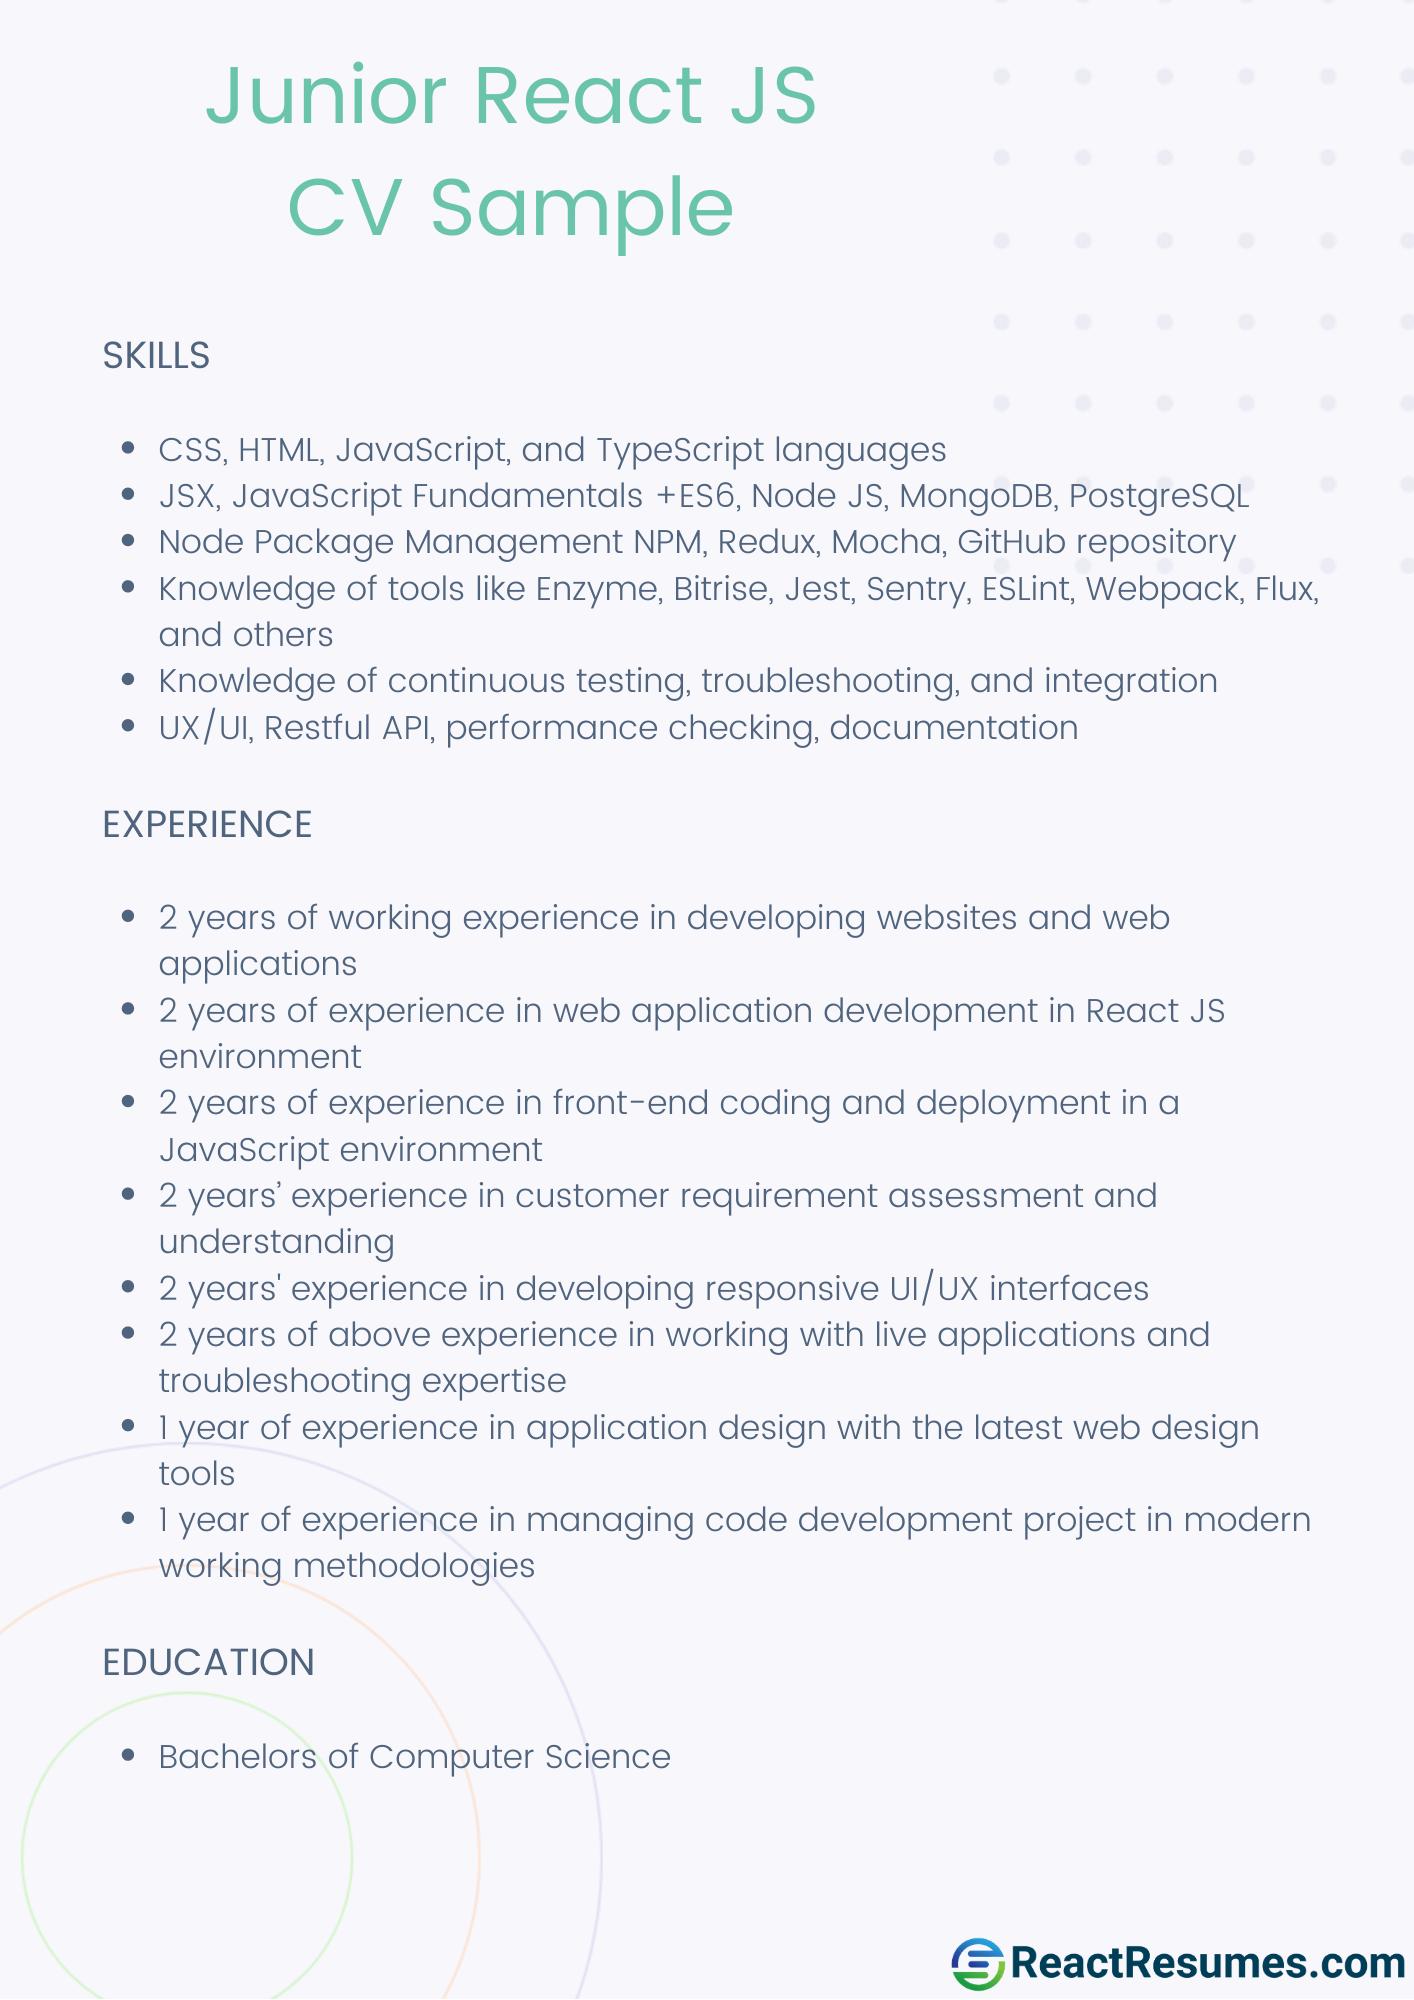 react junior developer cv example